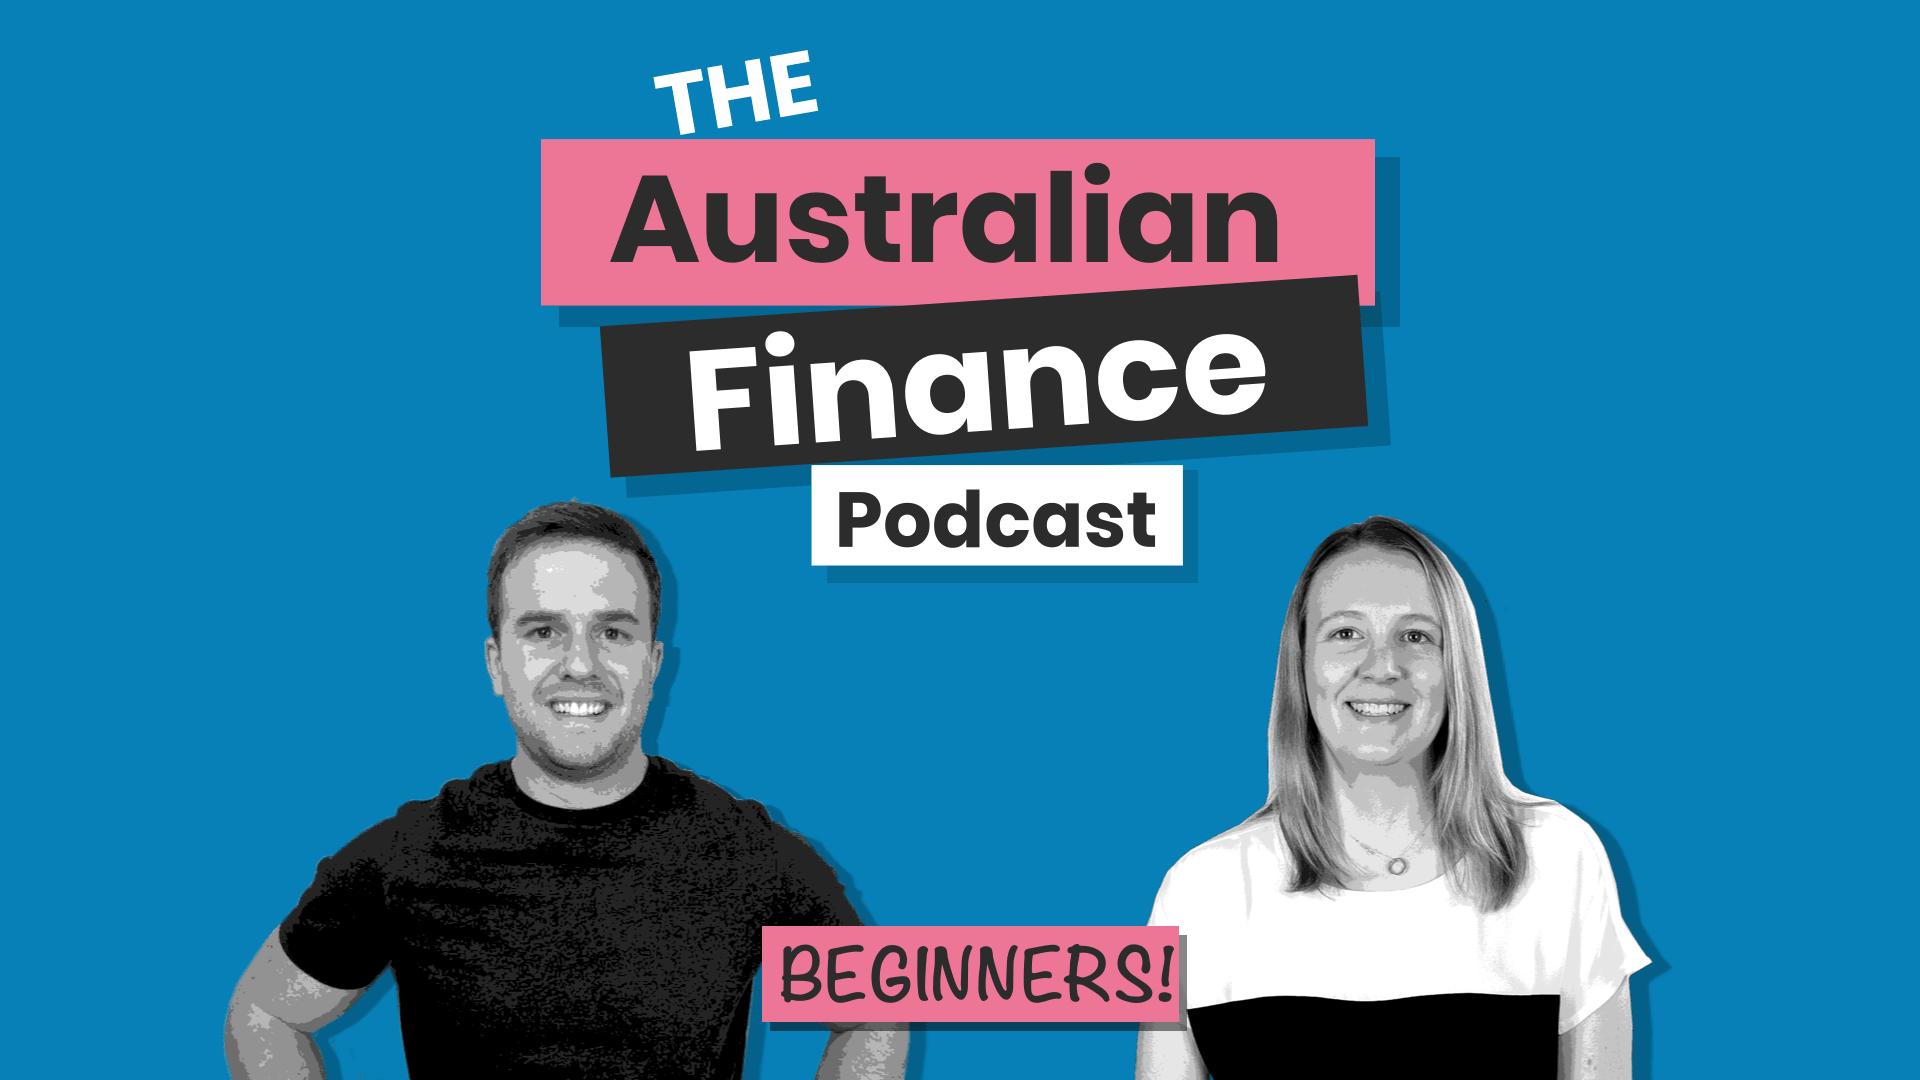 australian finance podcast logo image